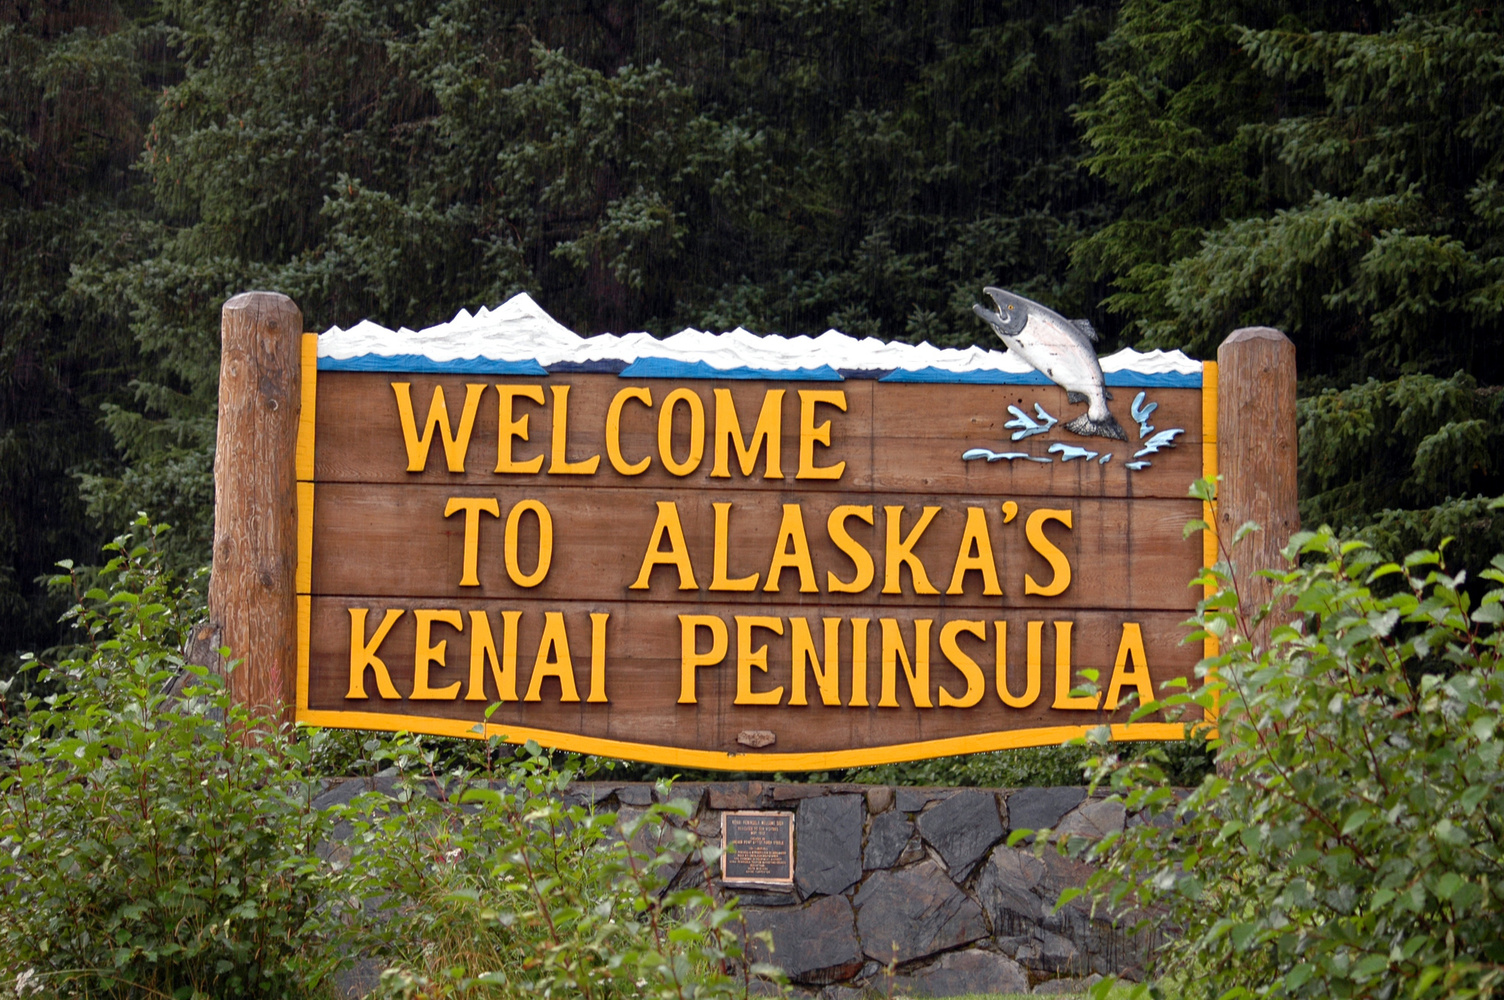 Welcome to the Alaska's Kenai Peninsula sign